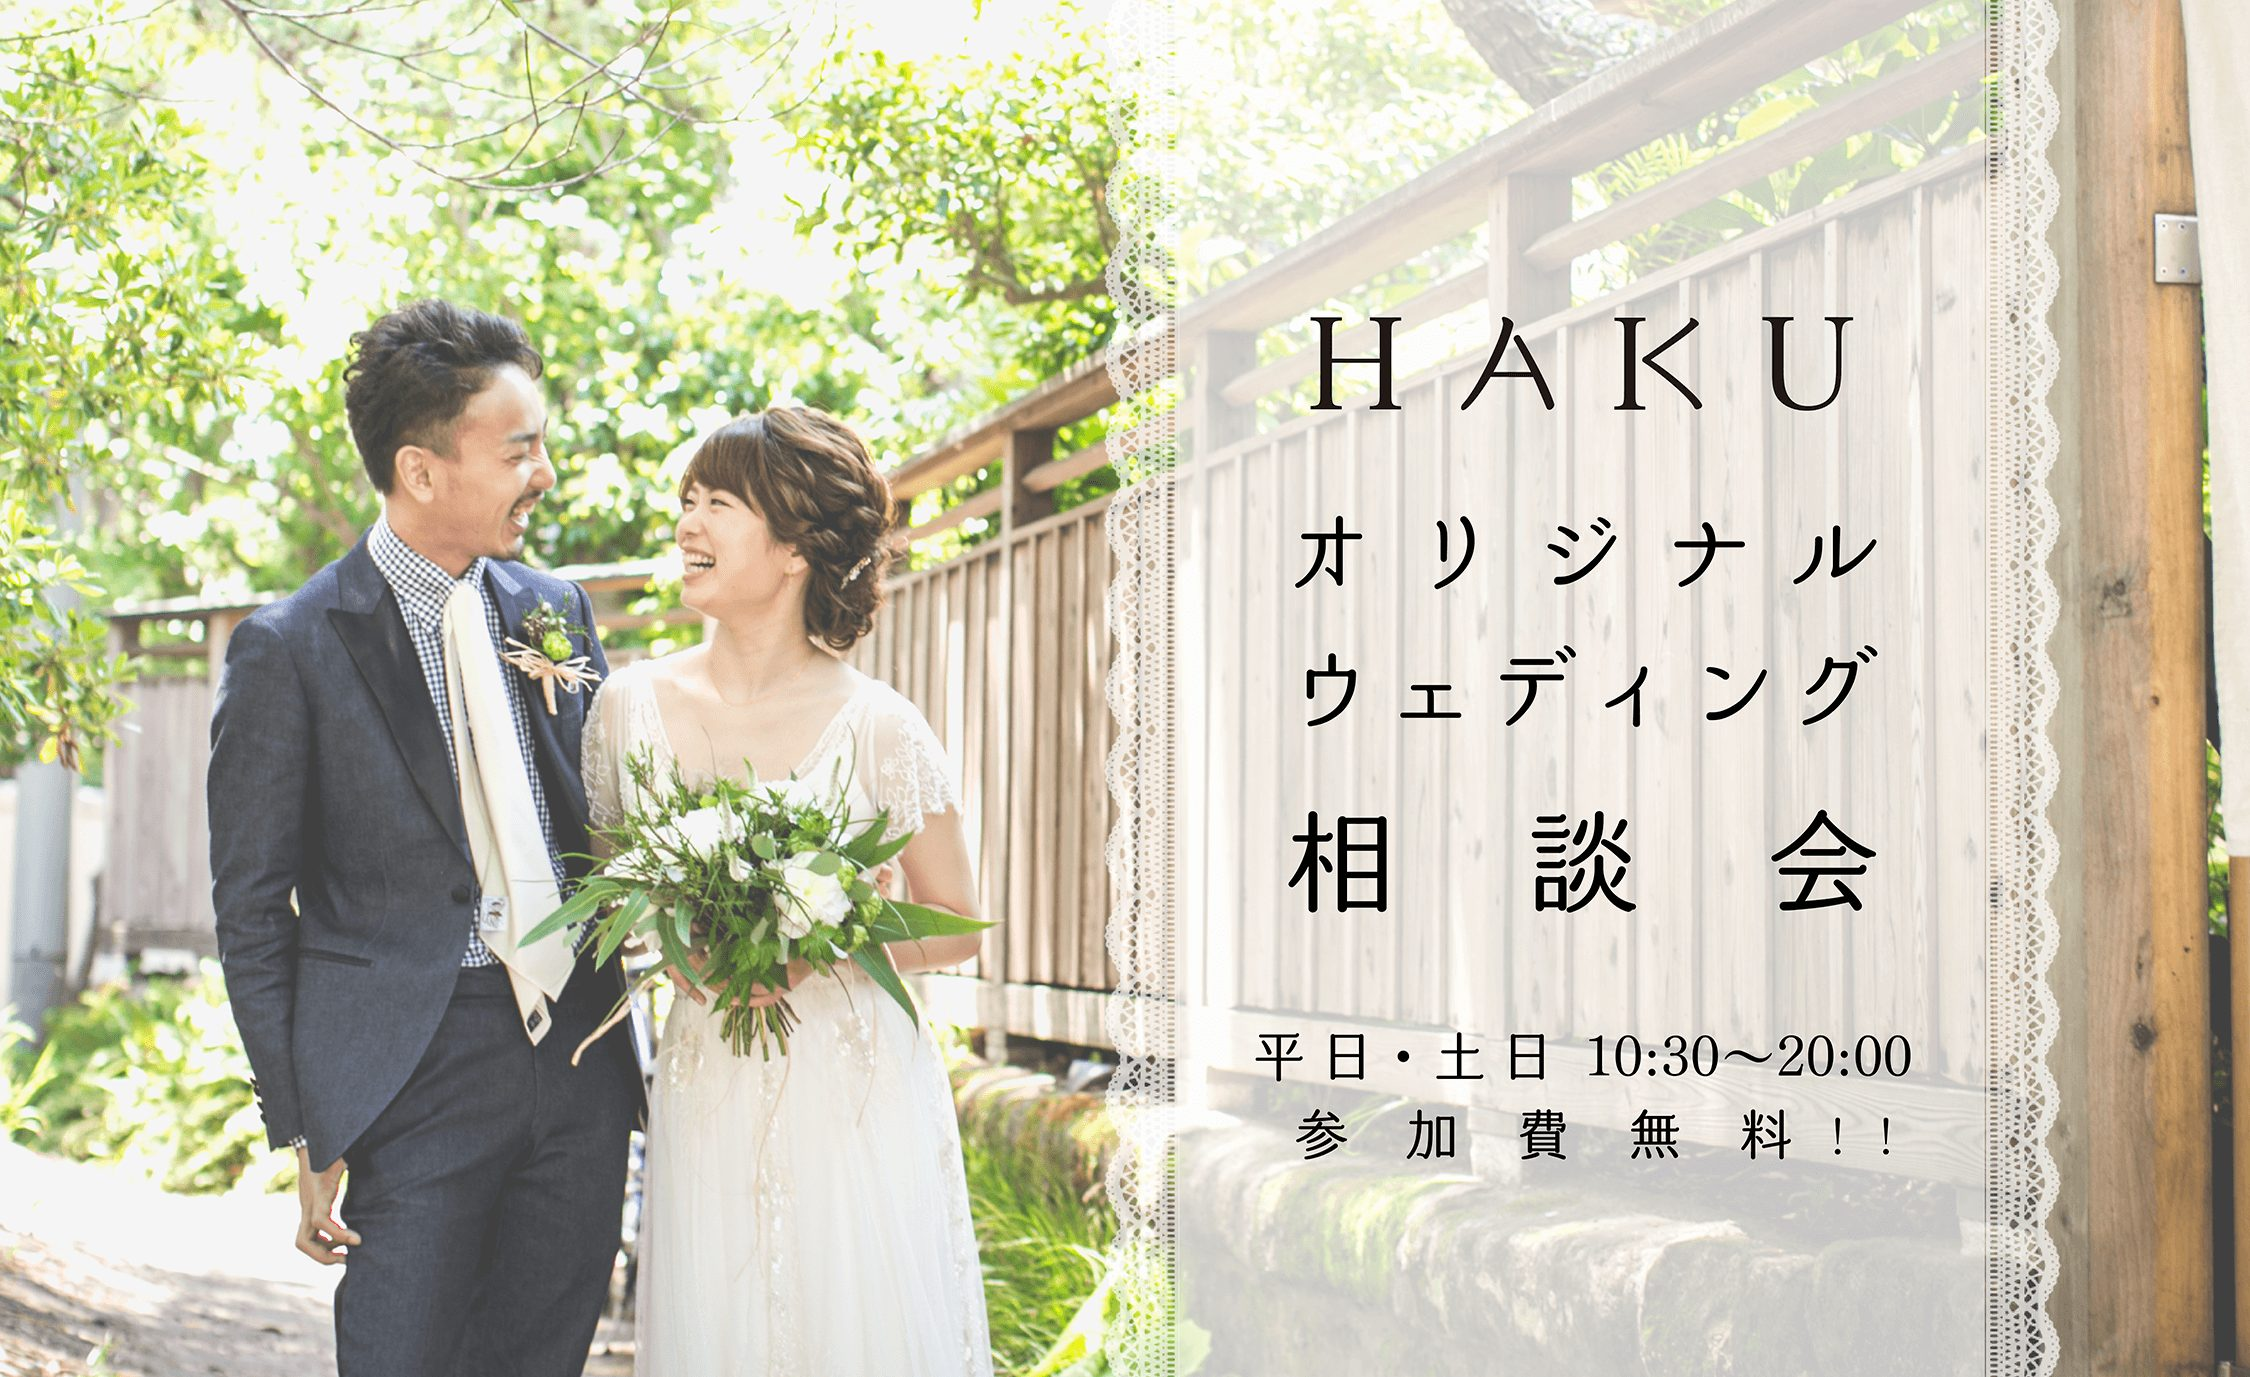 HAKUオリジナルウェディング相談会